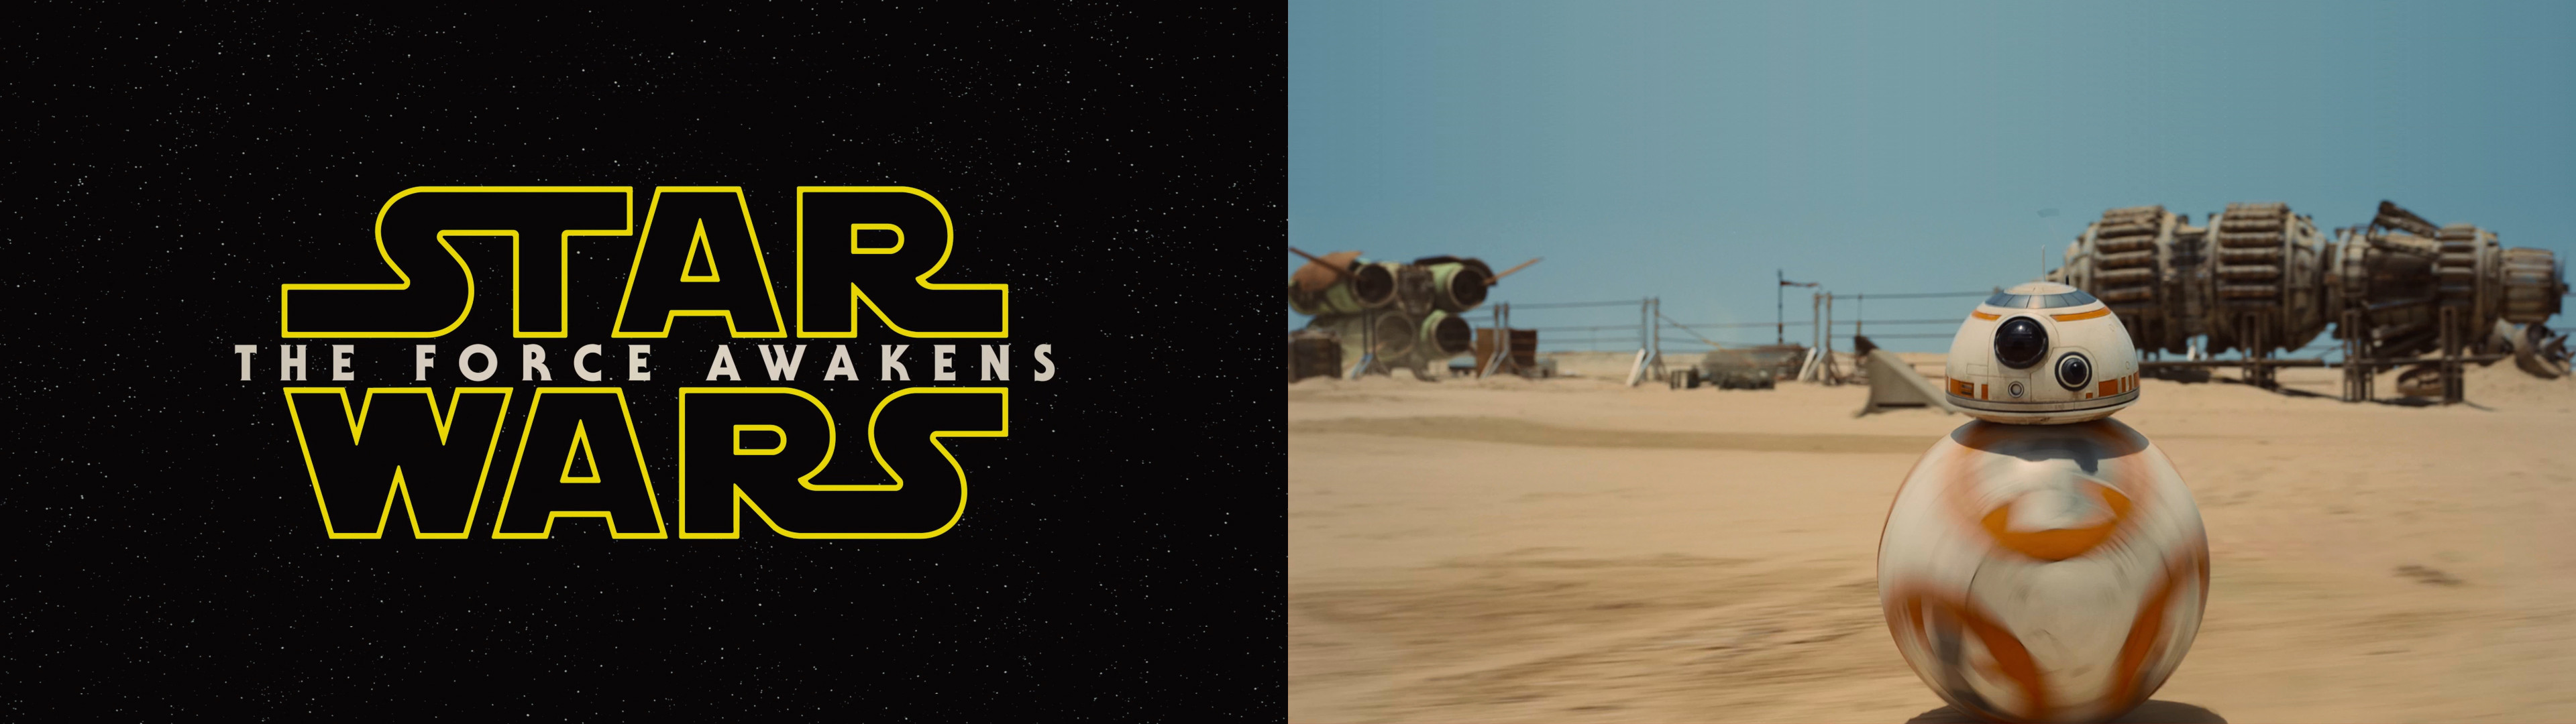 [3840 x 1080] A Star Wars: The Force Awakens split wallpaper.